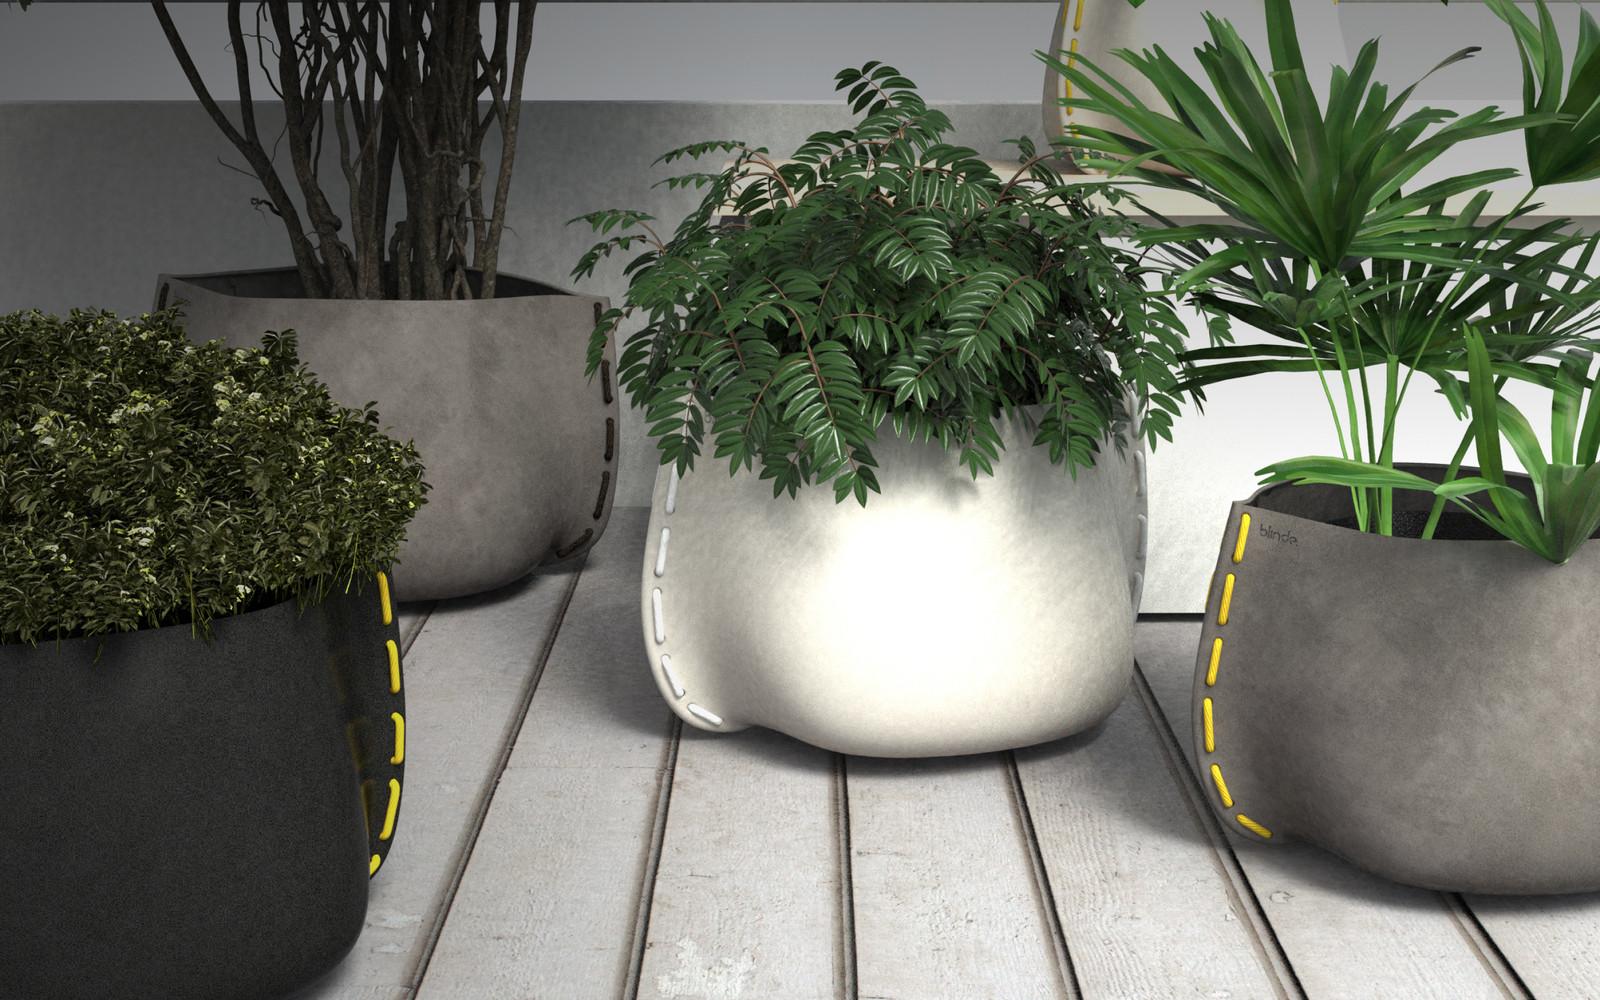 Stitch 100 - Plant Pot